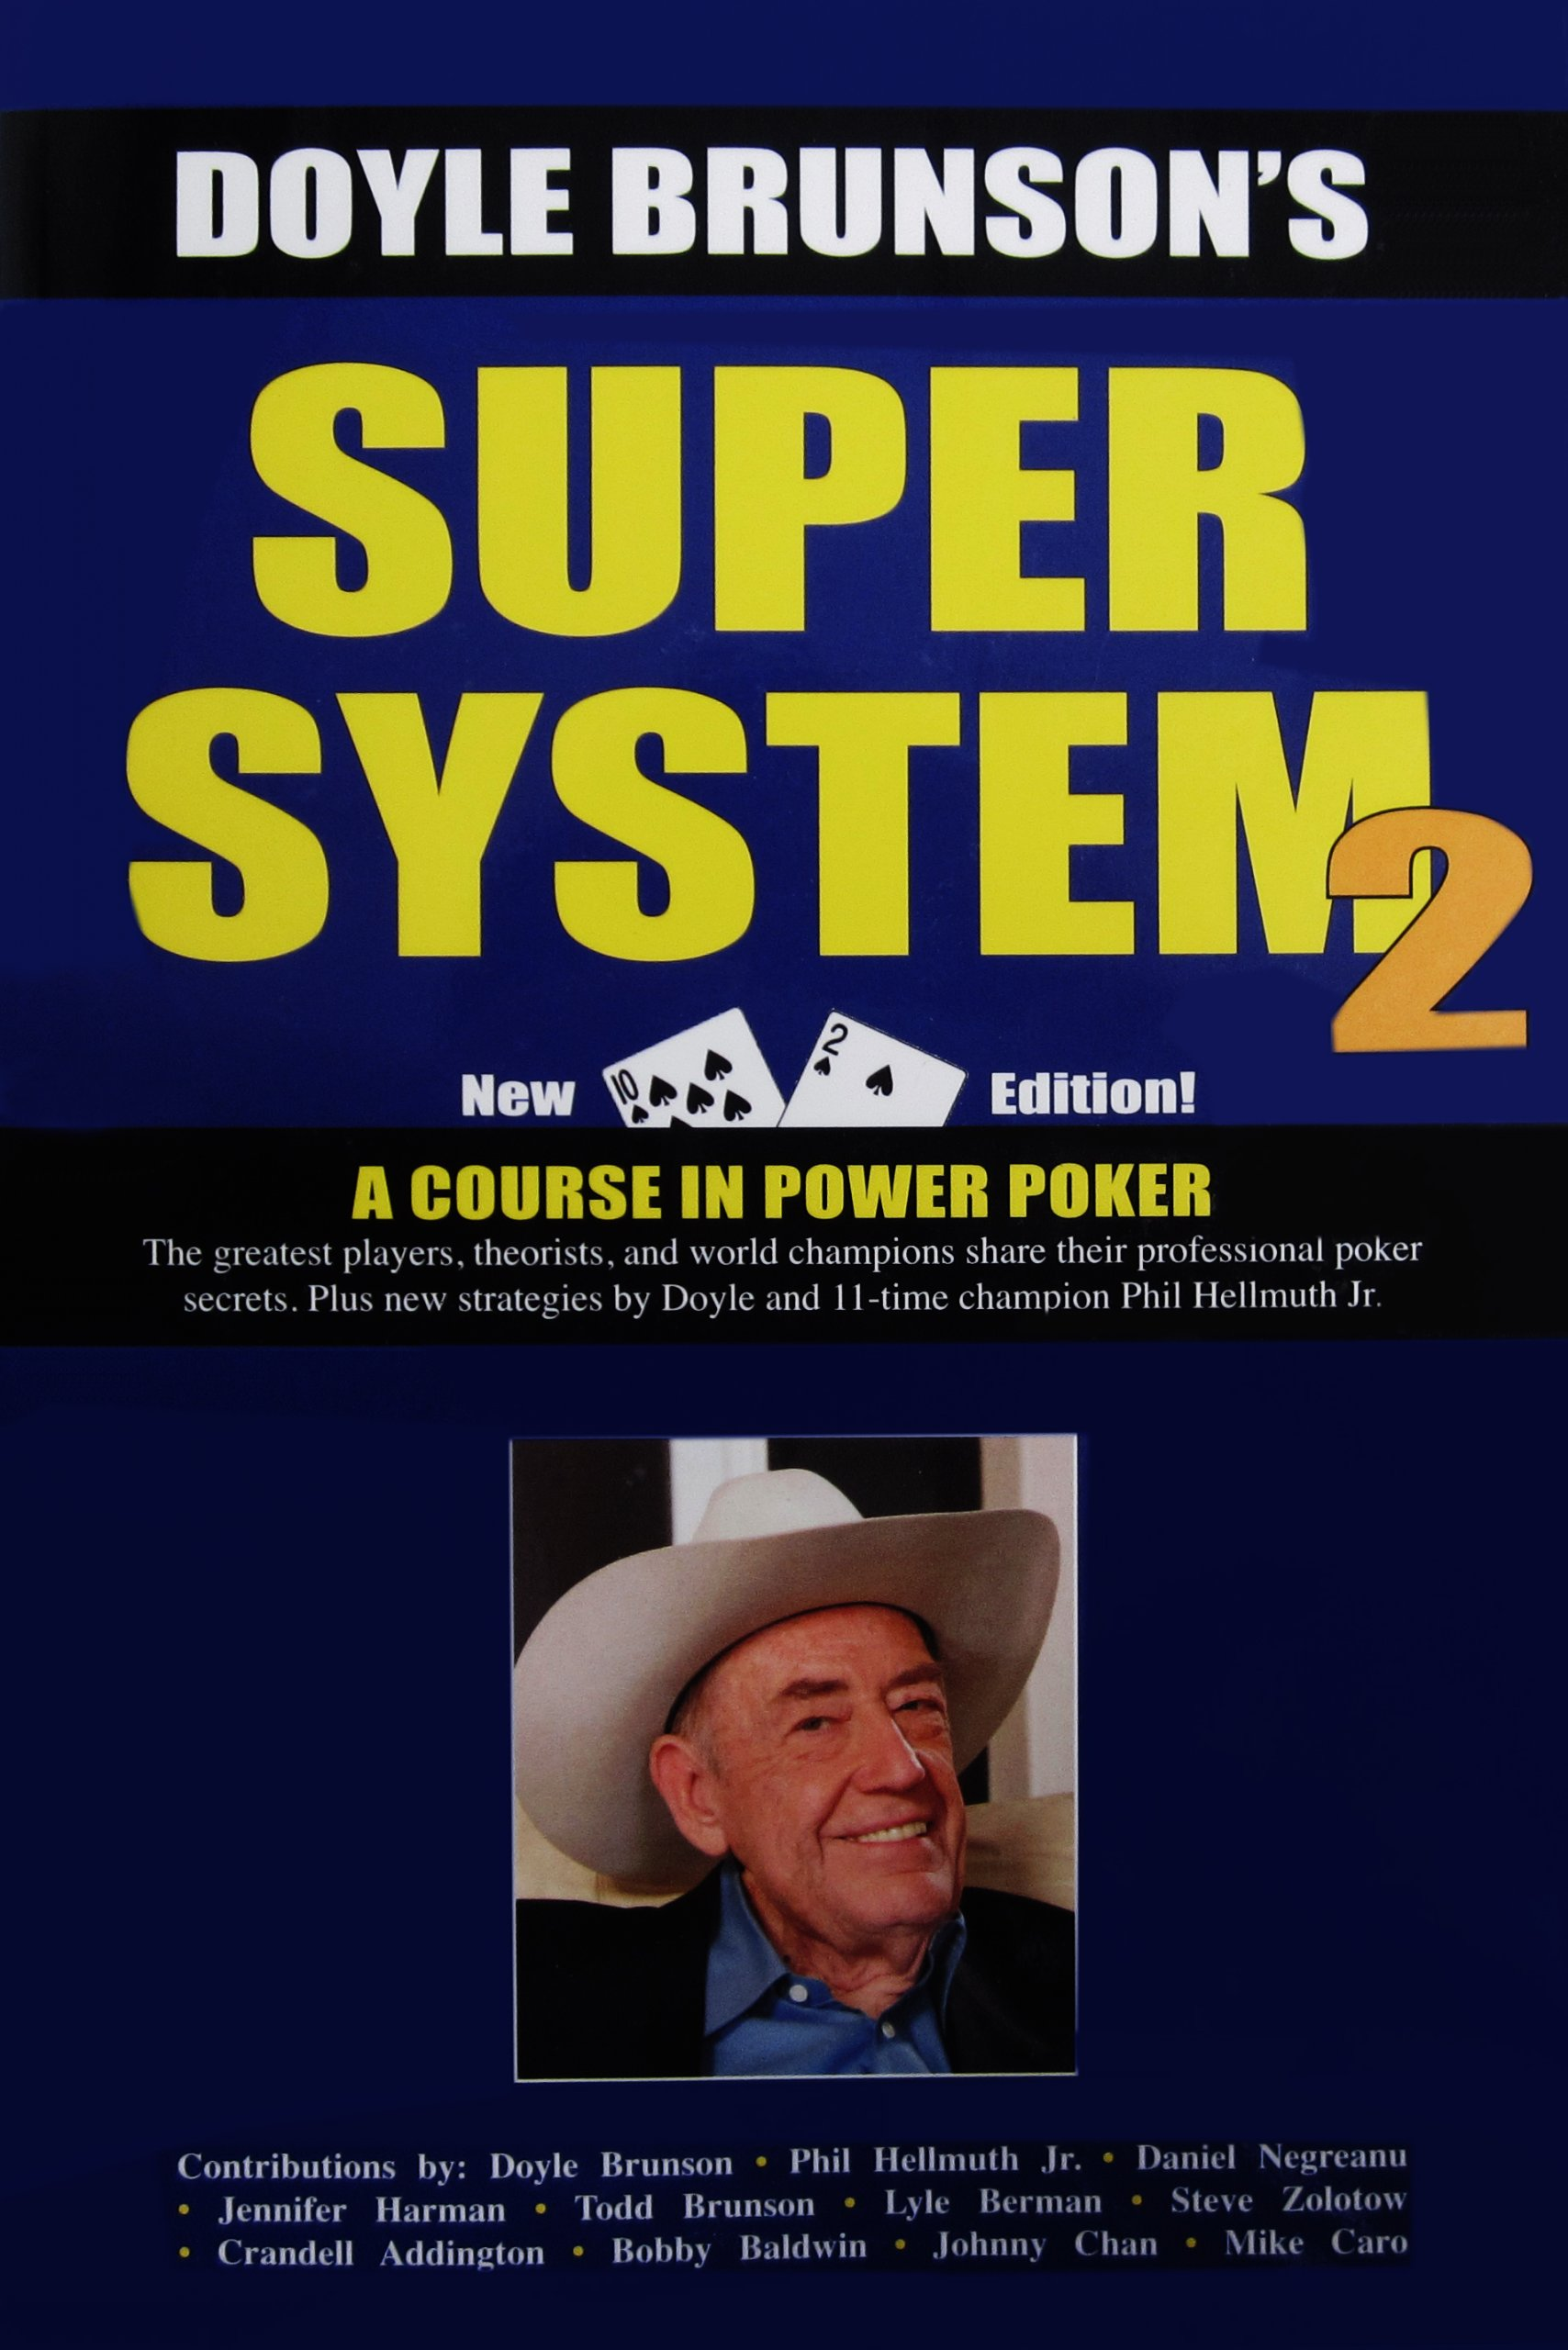 Download Super System 2 Winning Strategies for Limit Hold'em Cash Games and Tournament Tactics ebook